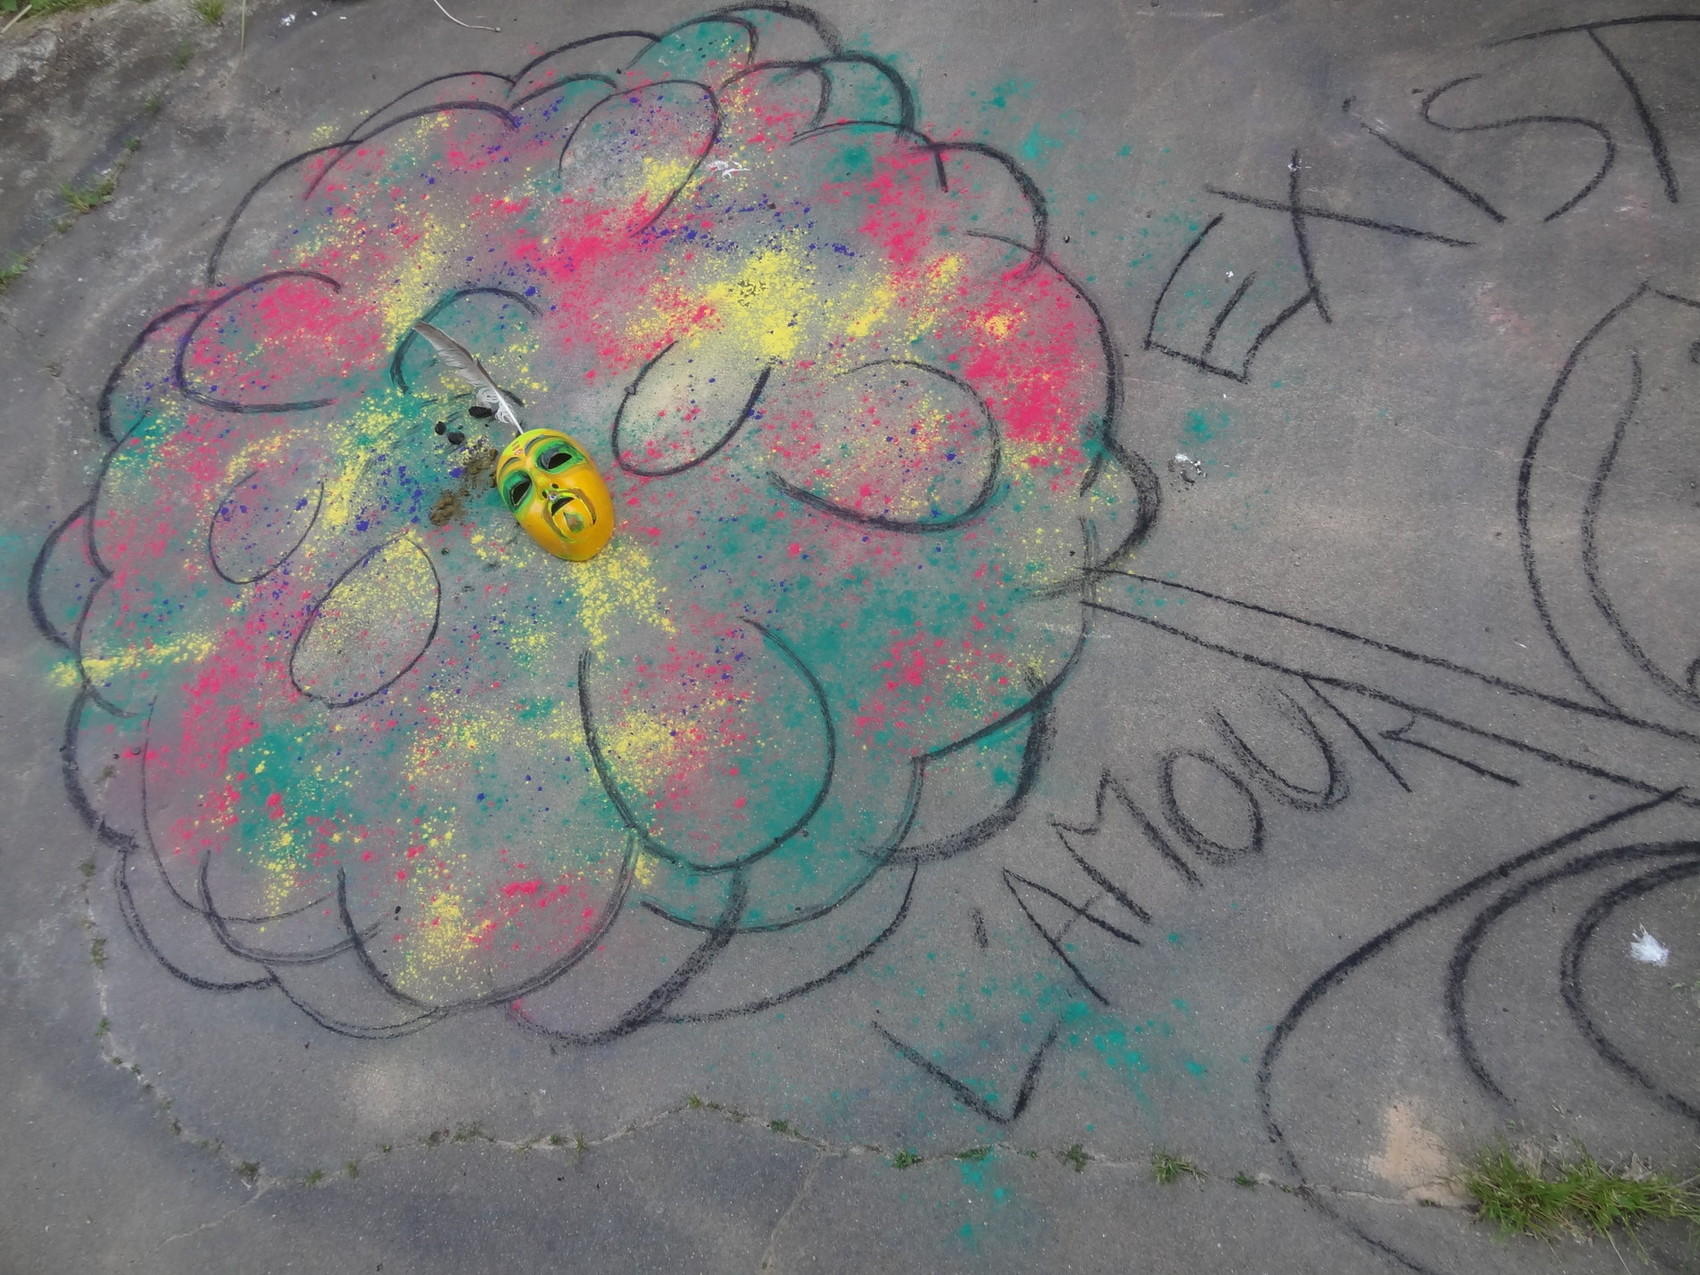 Poetic street art